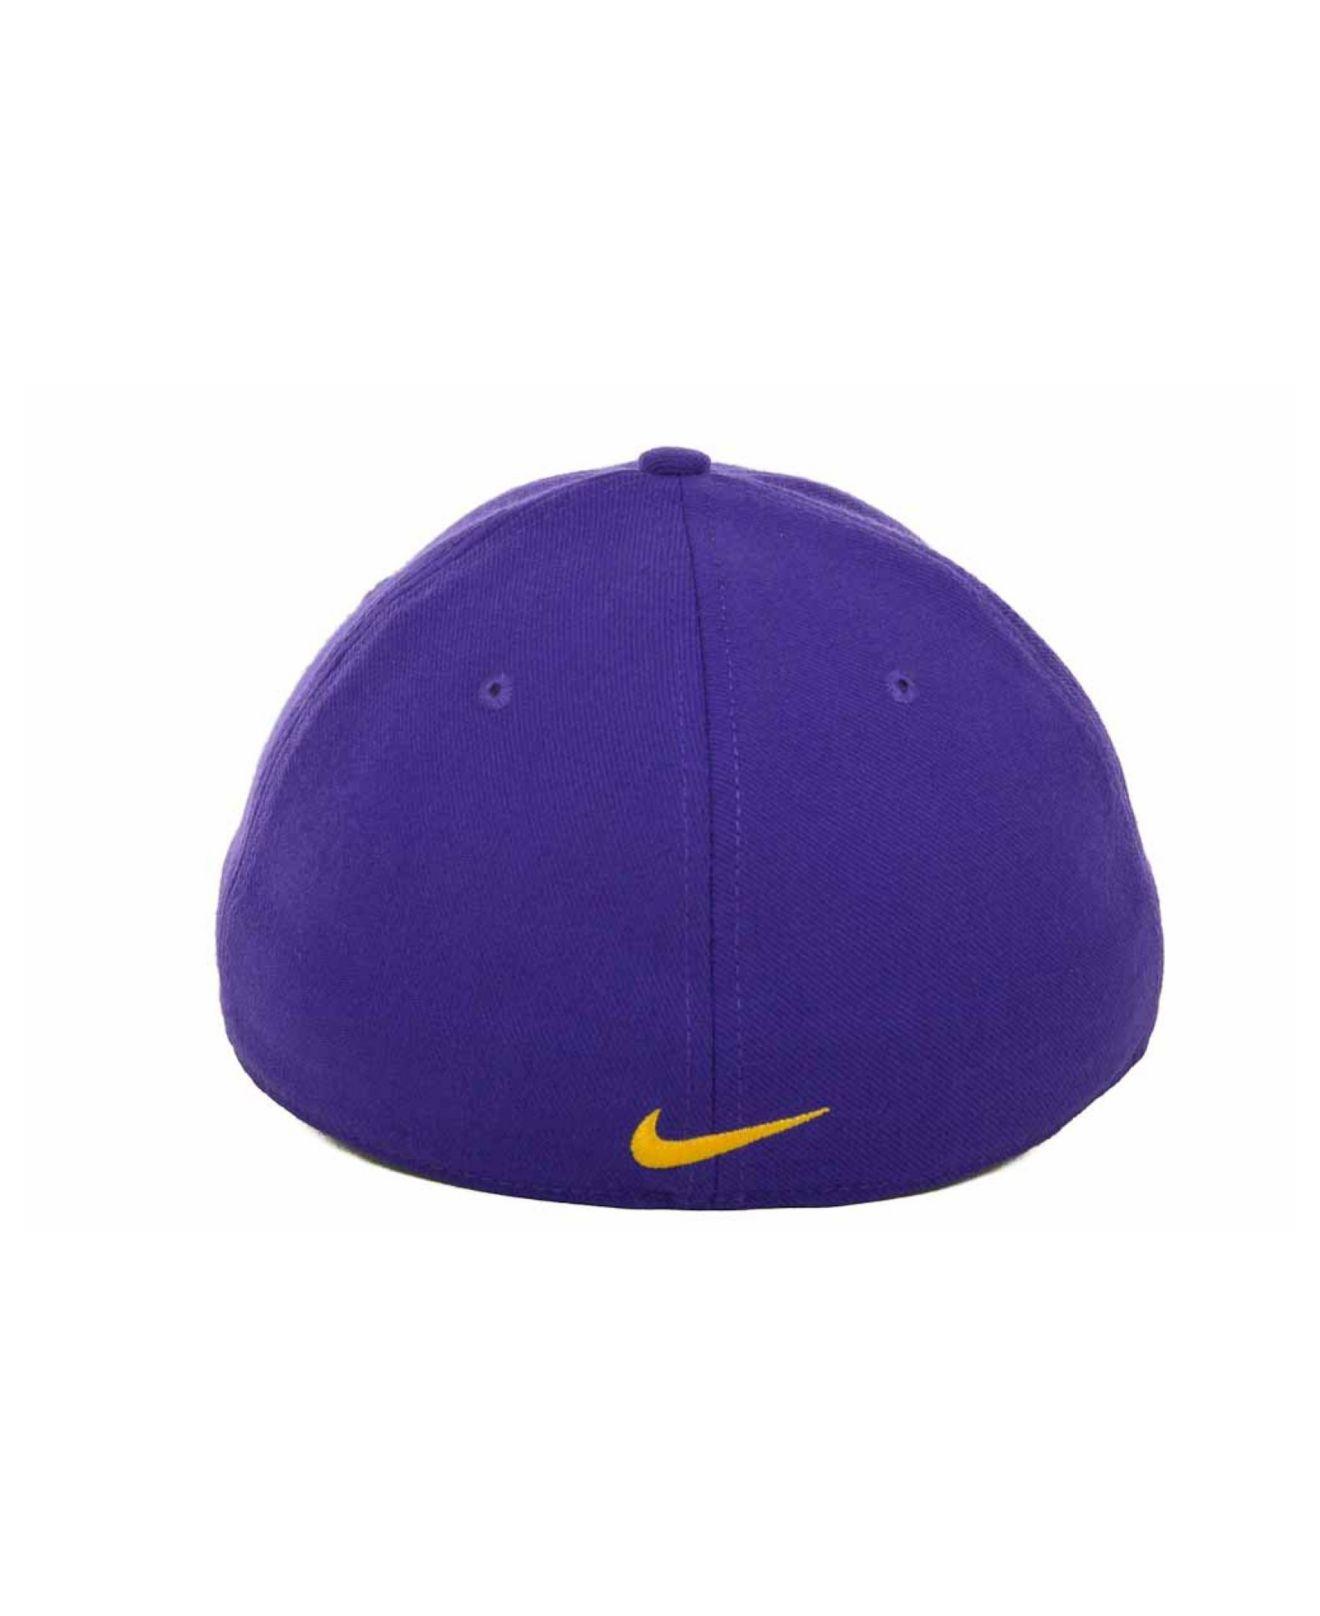 1068436214e ... where can i buy lyst nike lsu tigers drifit swooshflex cap in purple  for men 790d1